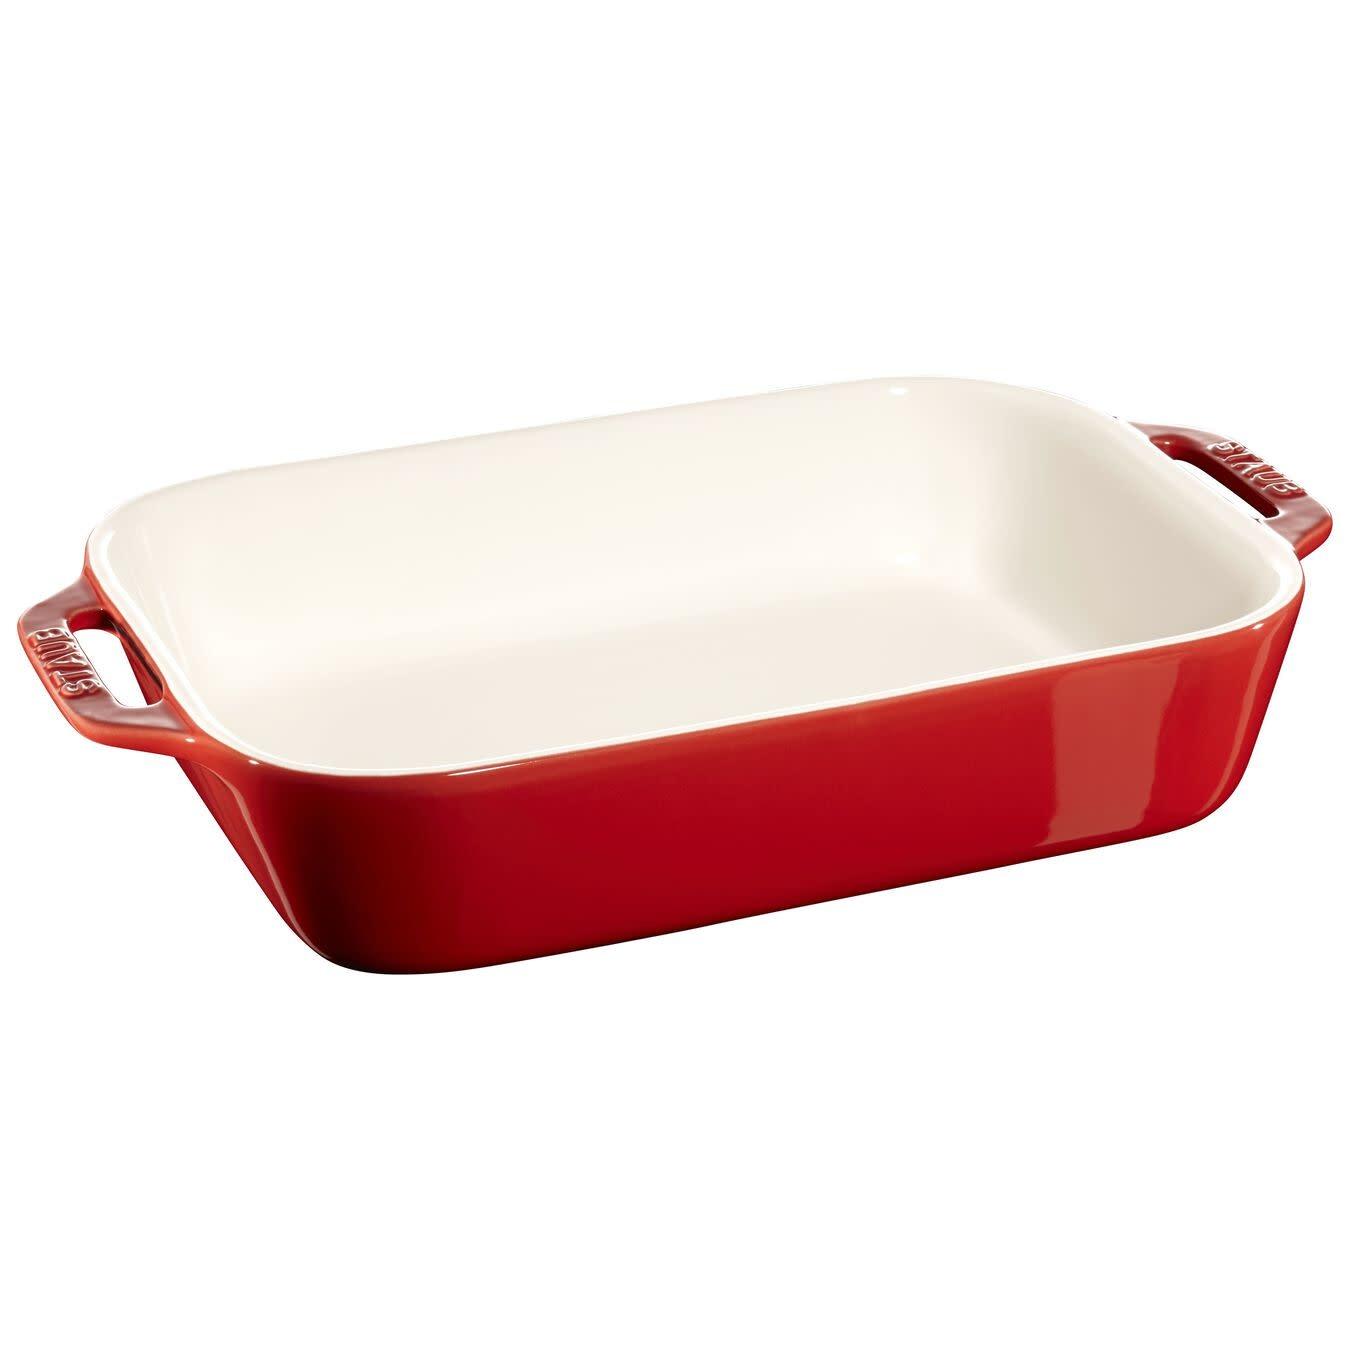 "Staub Rectangular Baking Dish Red 27x20cm/10.5""x7.5"""